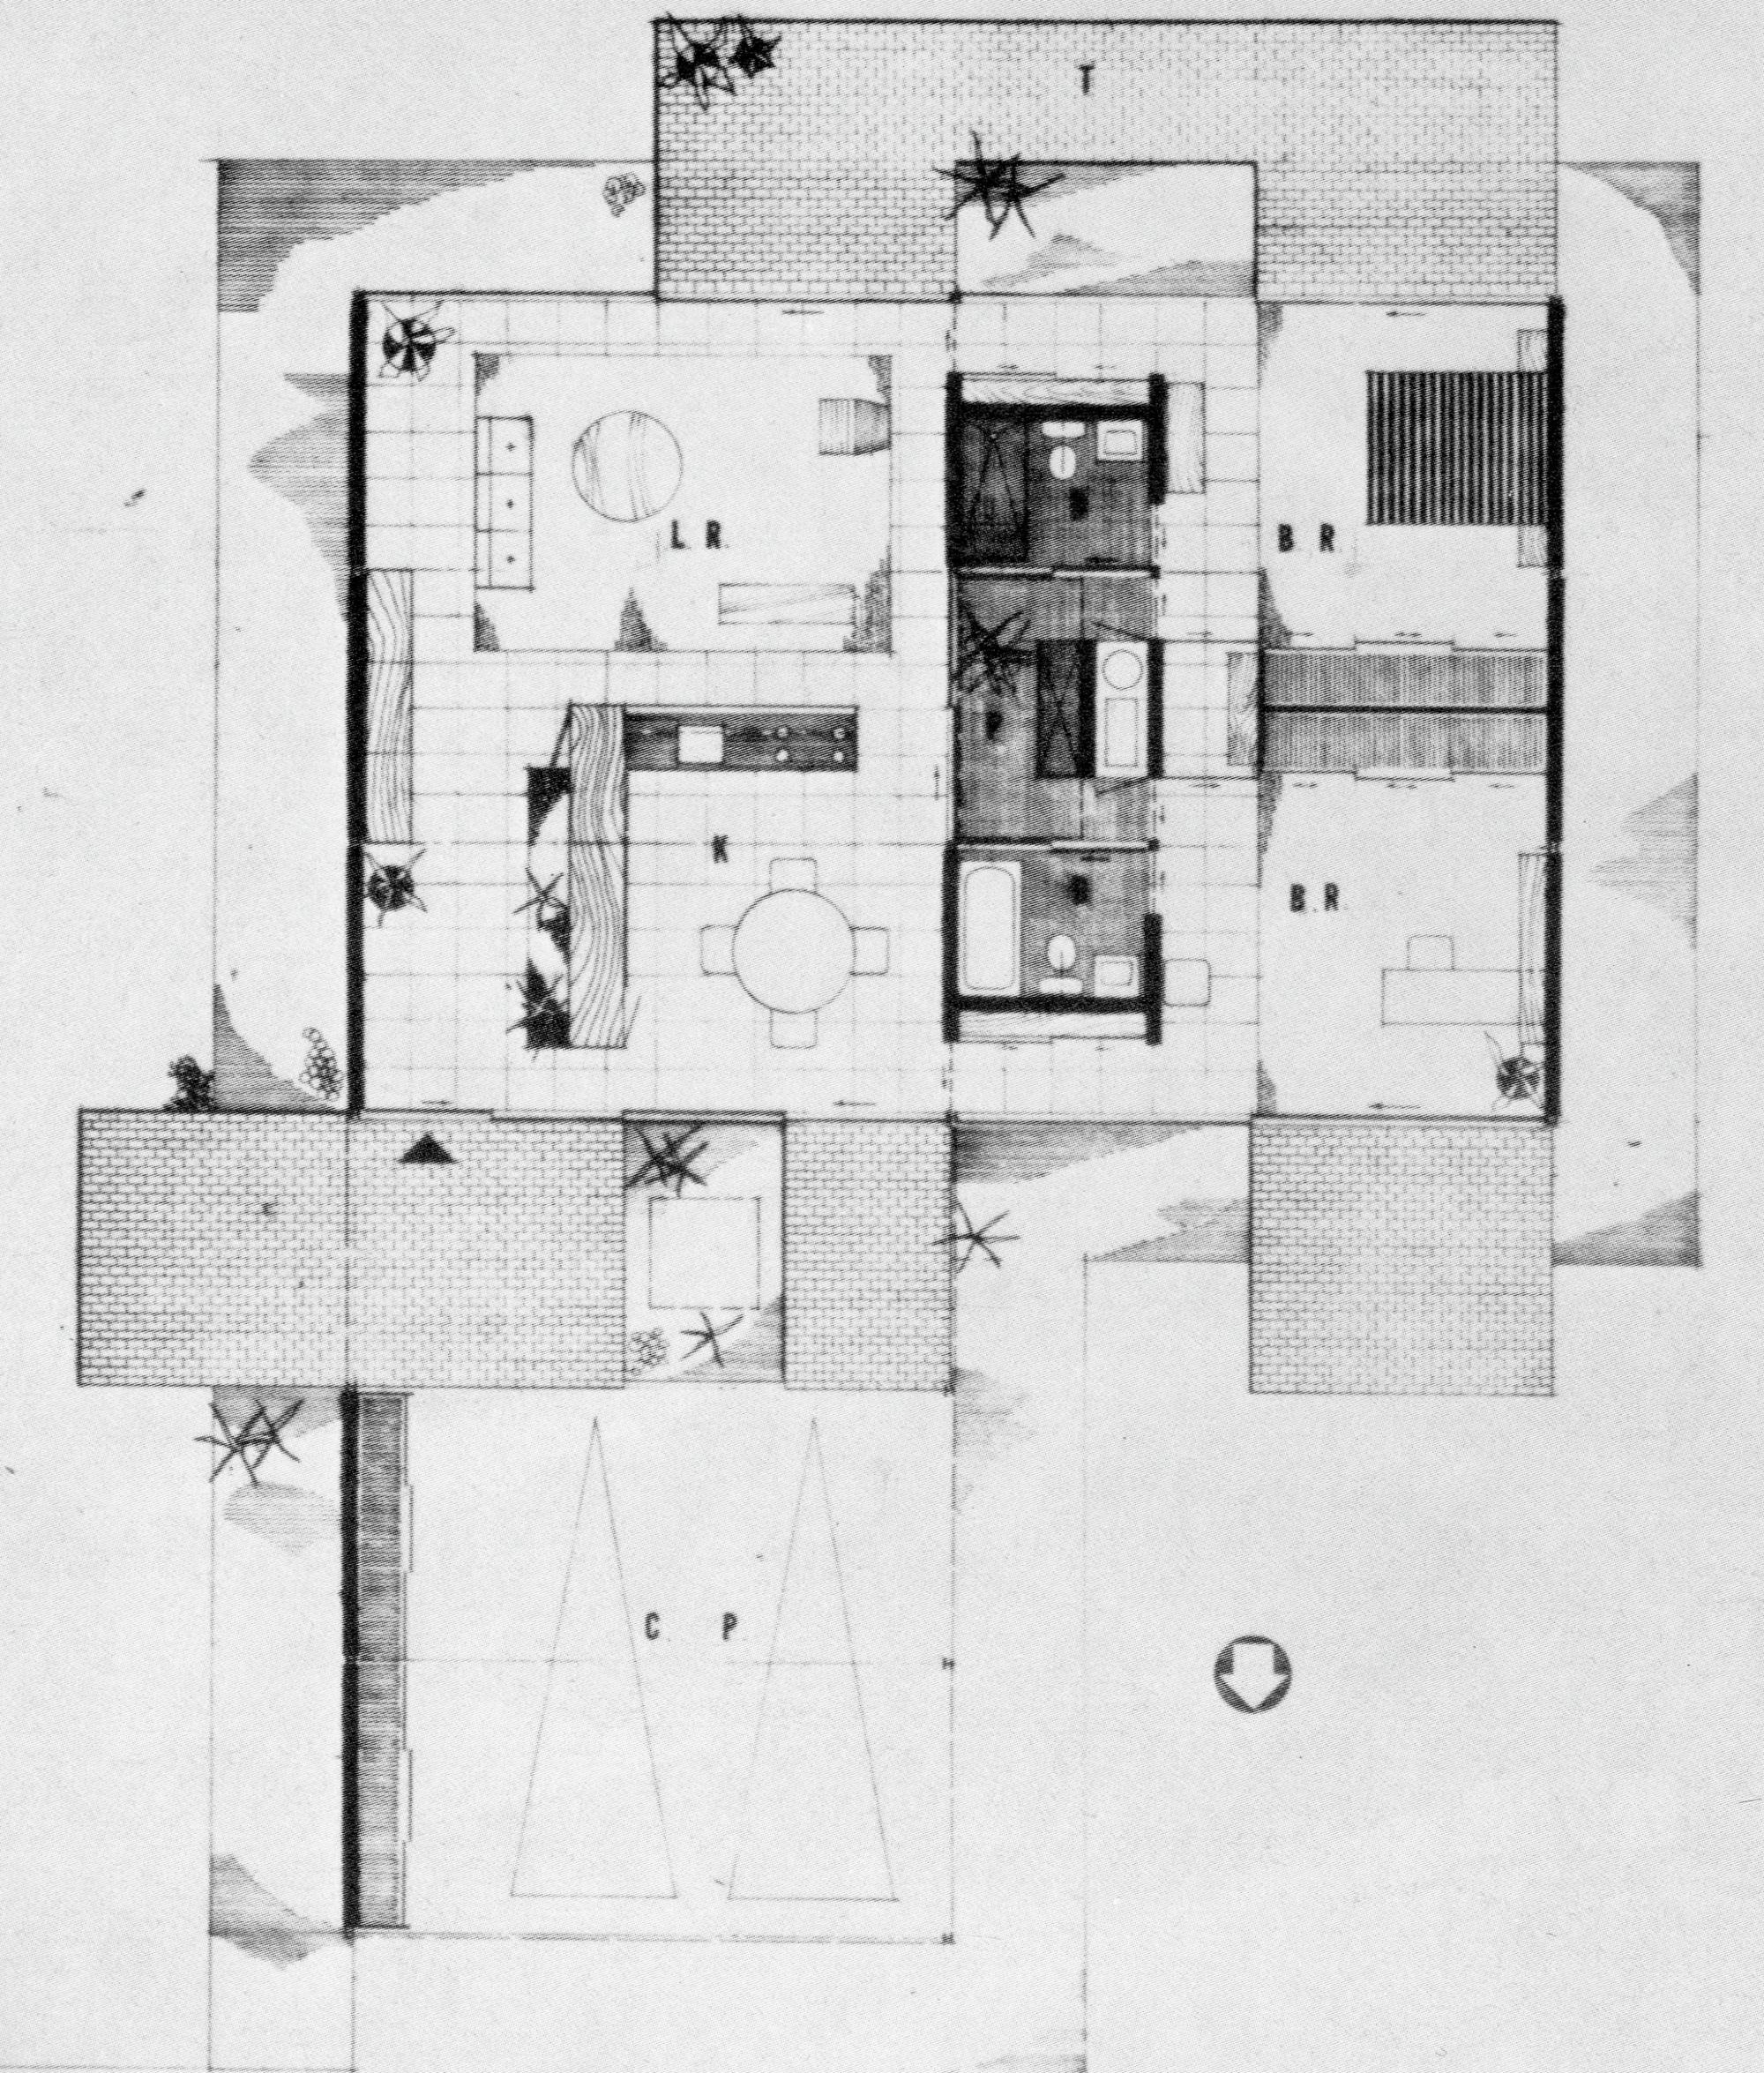 plan of Bailey House Plan, Case Study House No. 1, Pierre Koenig. 1958